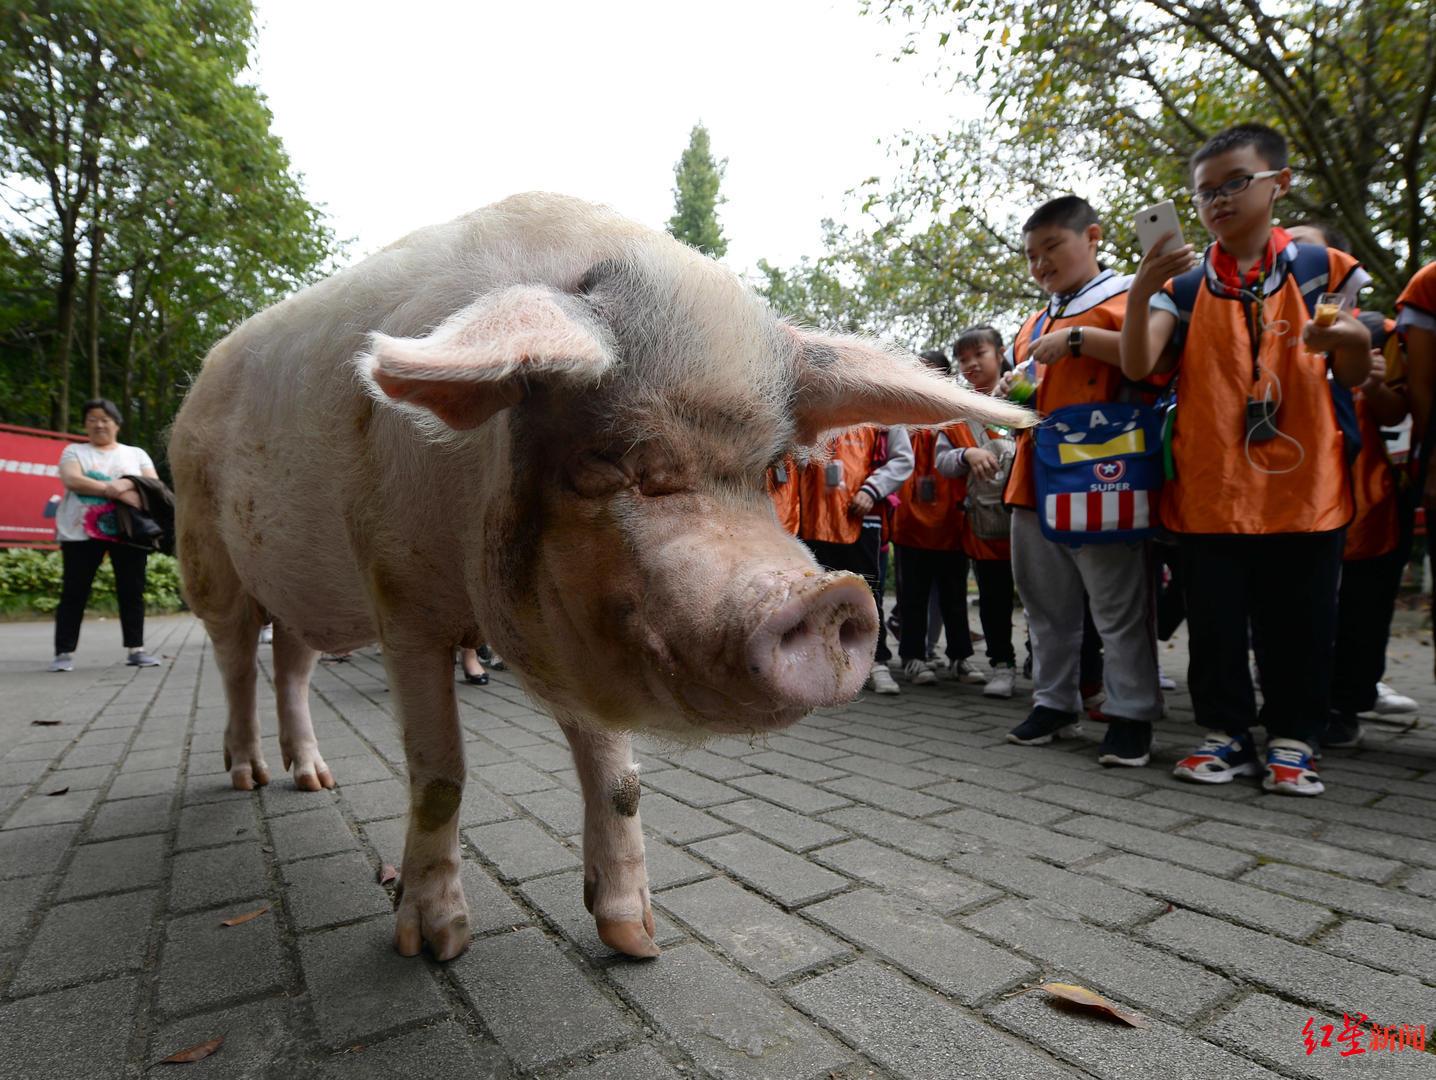 "<b>网传汶川地震""猪坚强""已走不动 饲养员:能走,只是走得慢</b>"